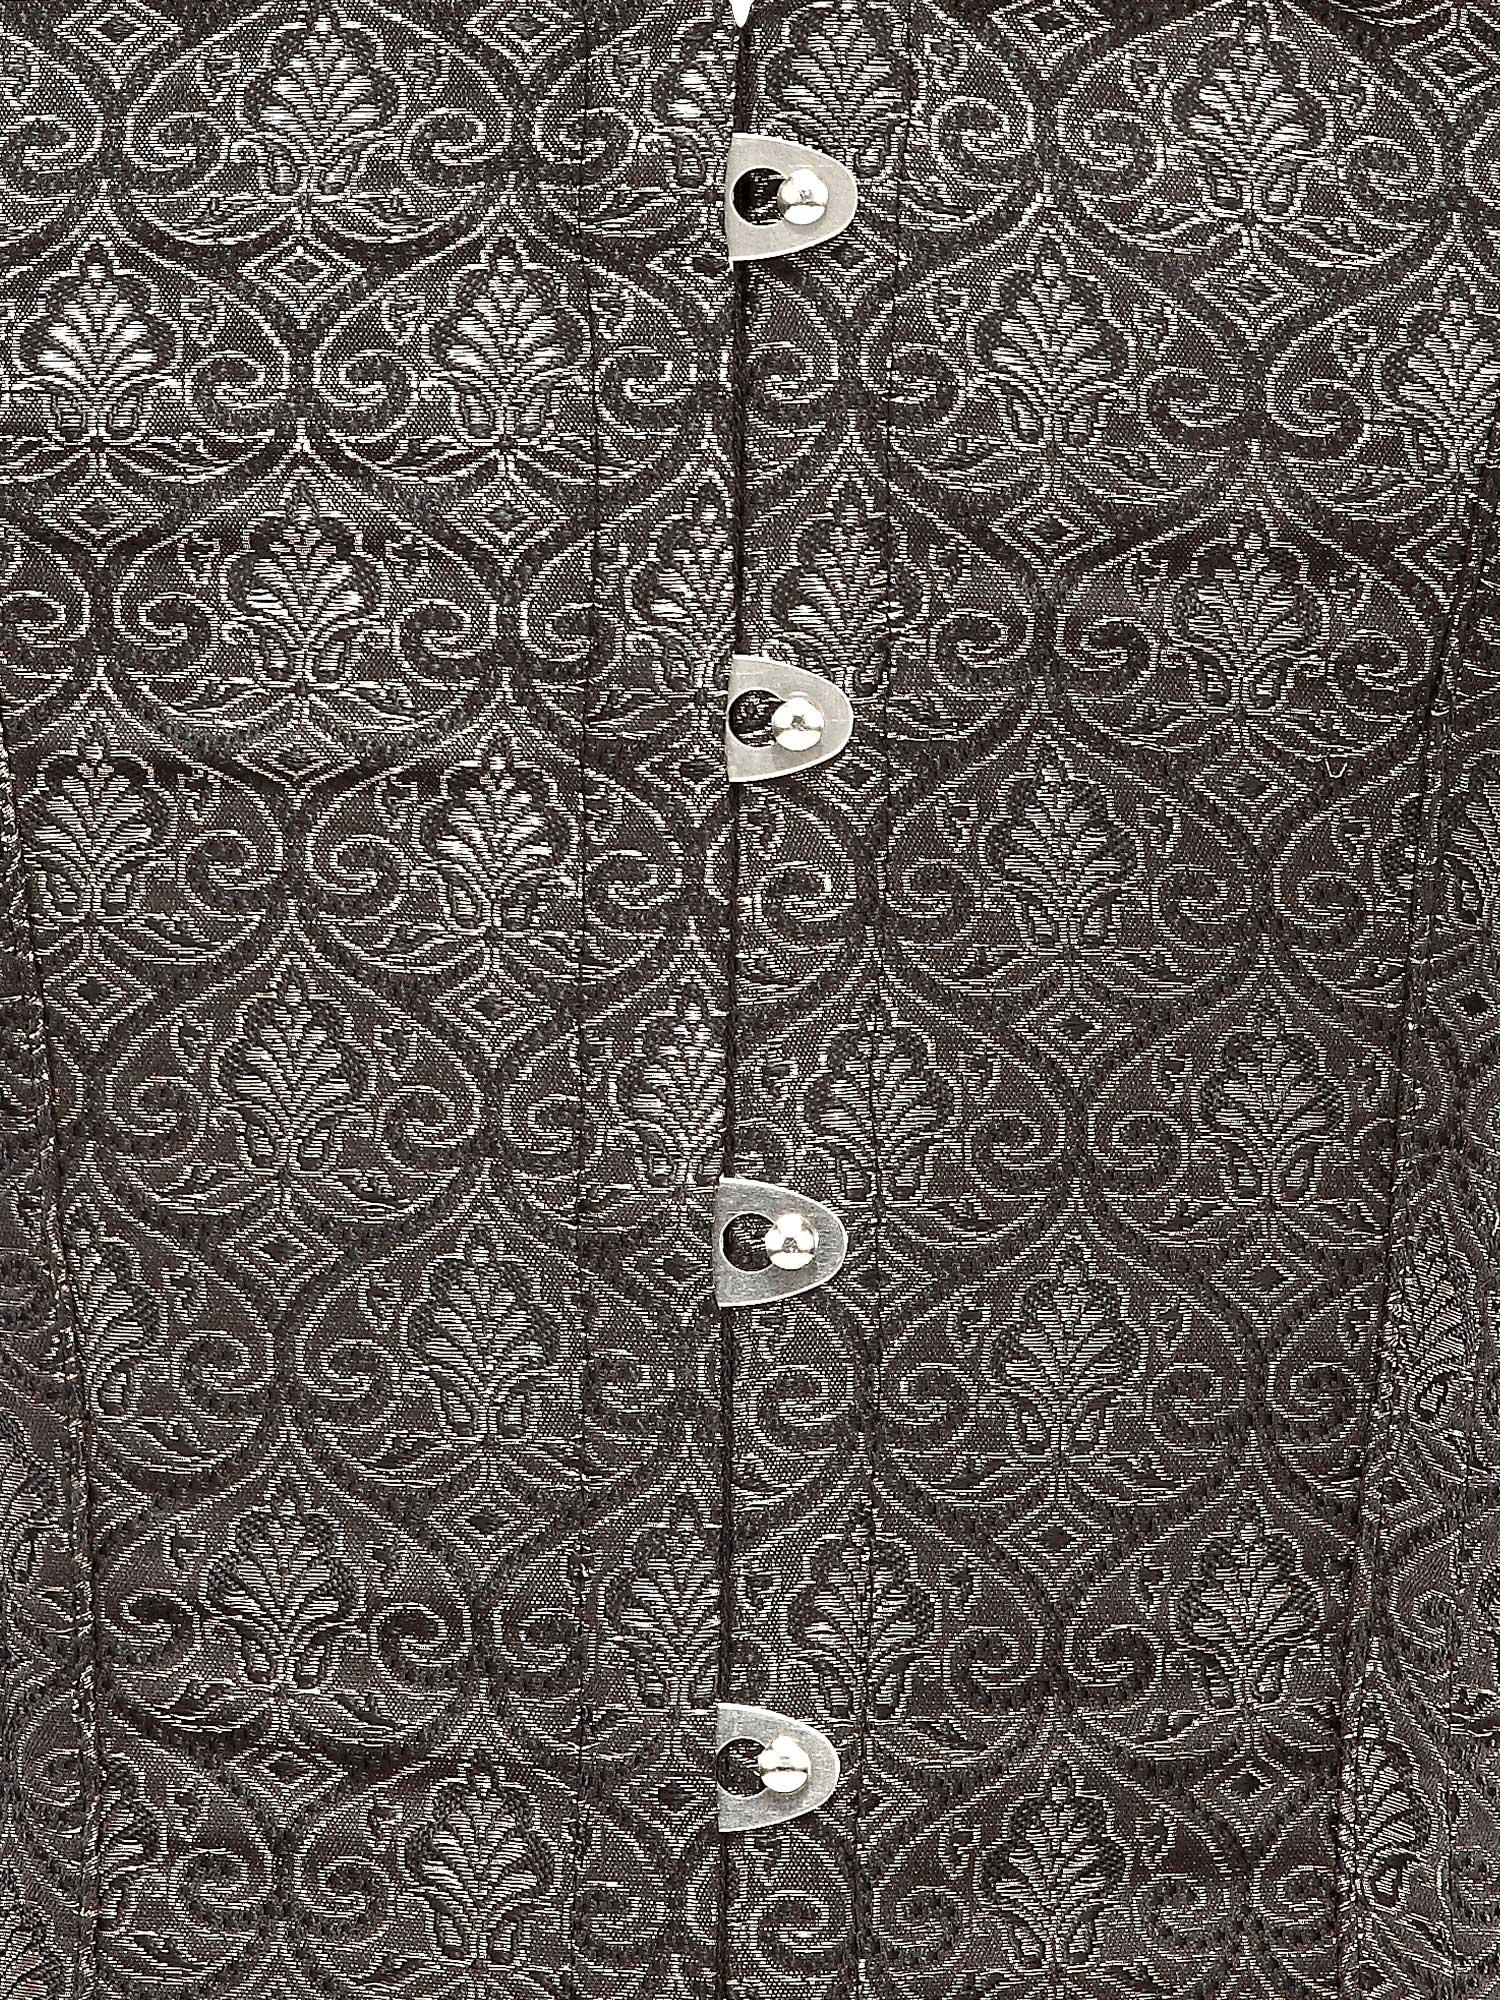 brown_brocade_fabric_steel_boning_corset_waist_cincher_bustier_bustiers_and_corsets_2.jpg